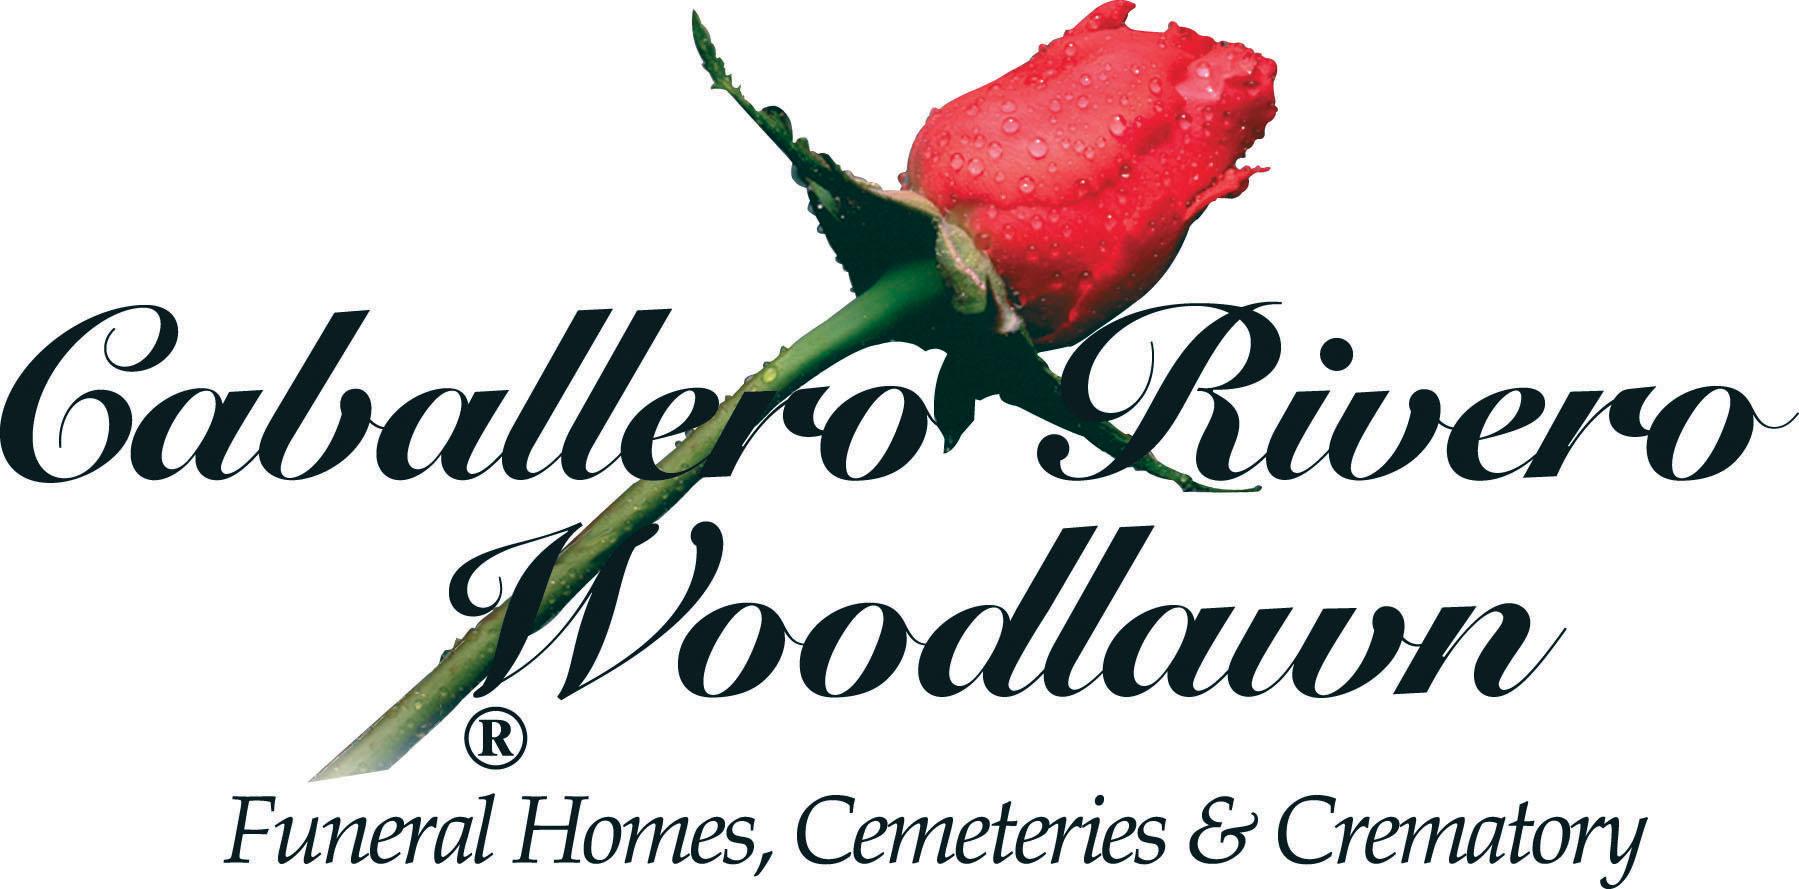 Woodlawn Park Cemetery West